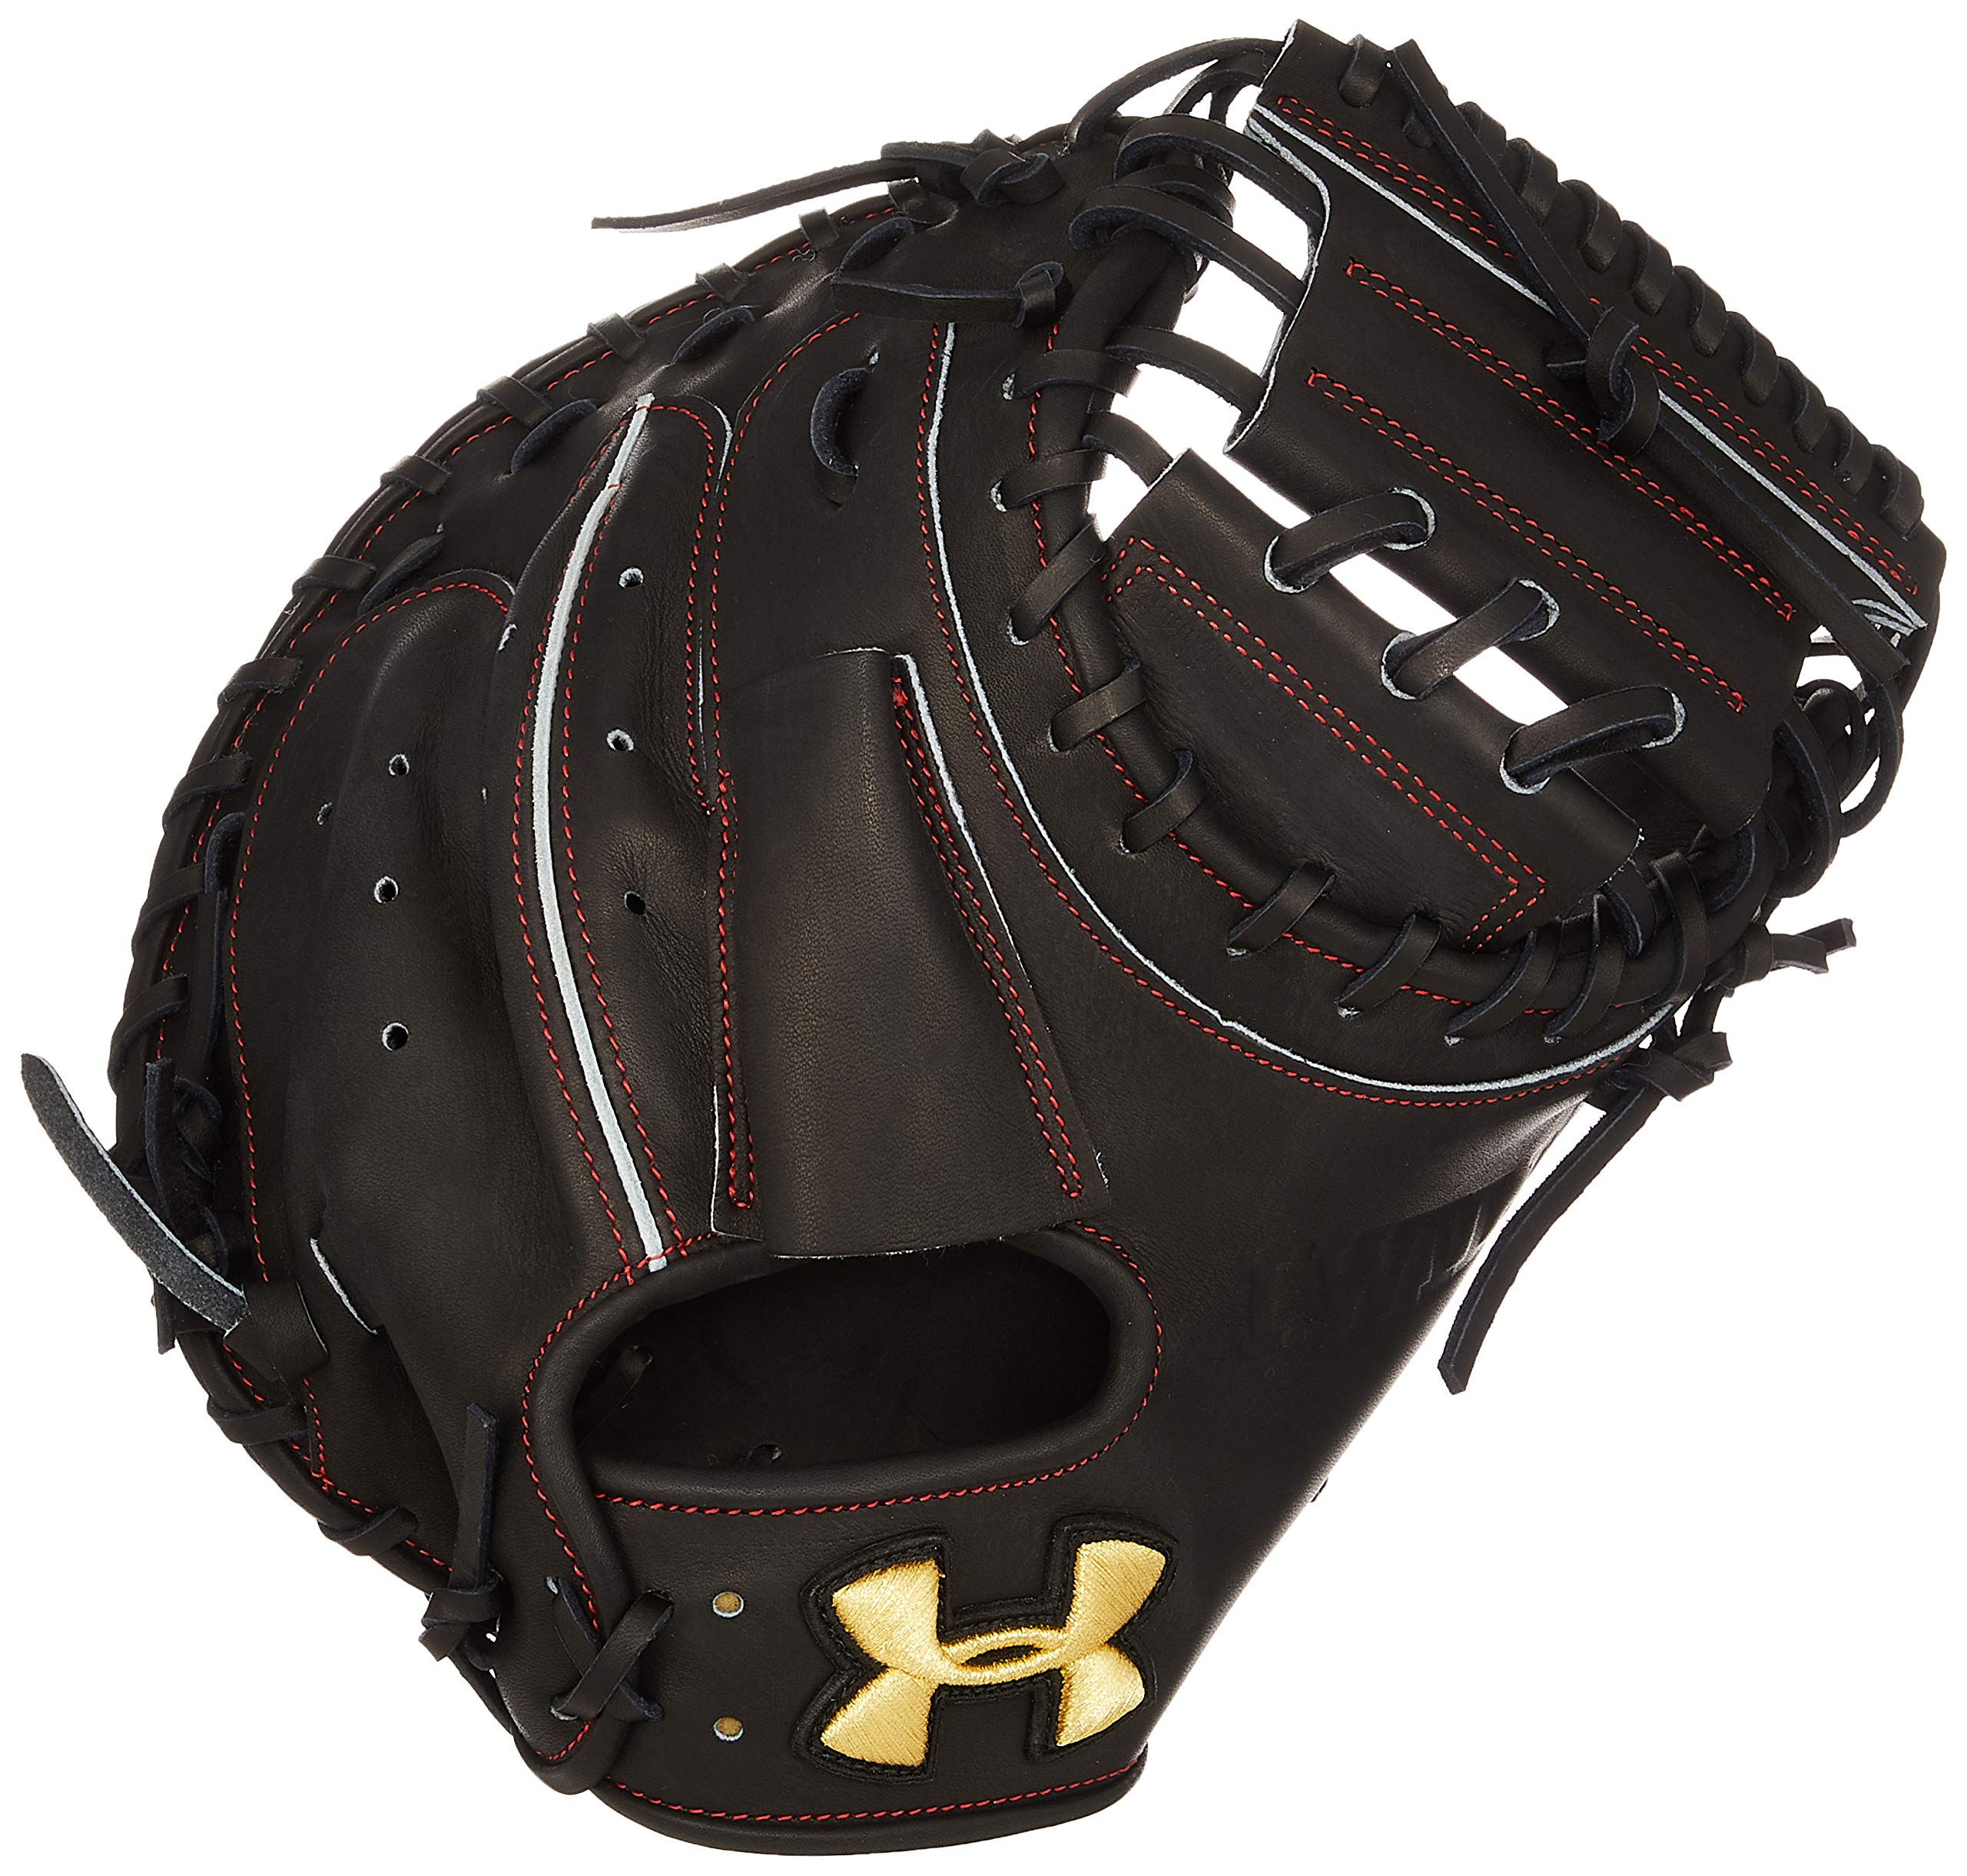 UNDER ARMOUR 硬式グラブ 野球用 右投げ捕手用 メンズ 1313785 ブラック 30.5cm